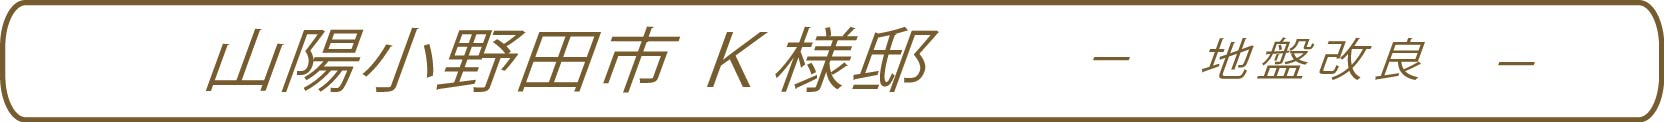 KuraSi-natu-sin83-11.jpg